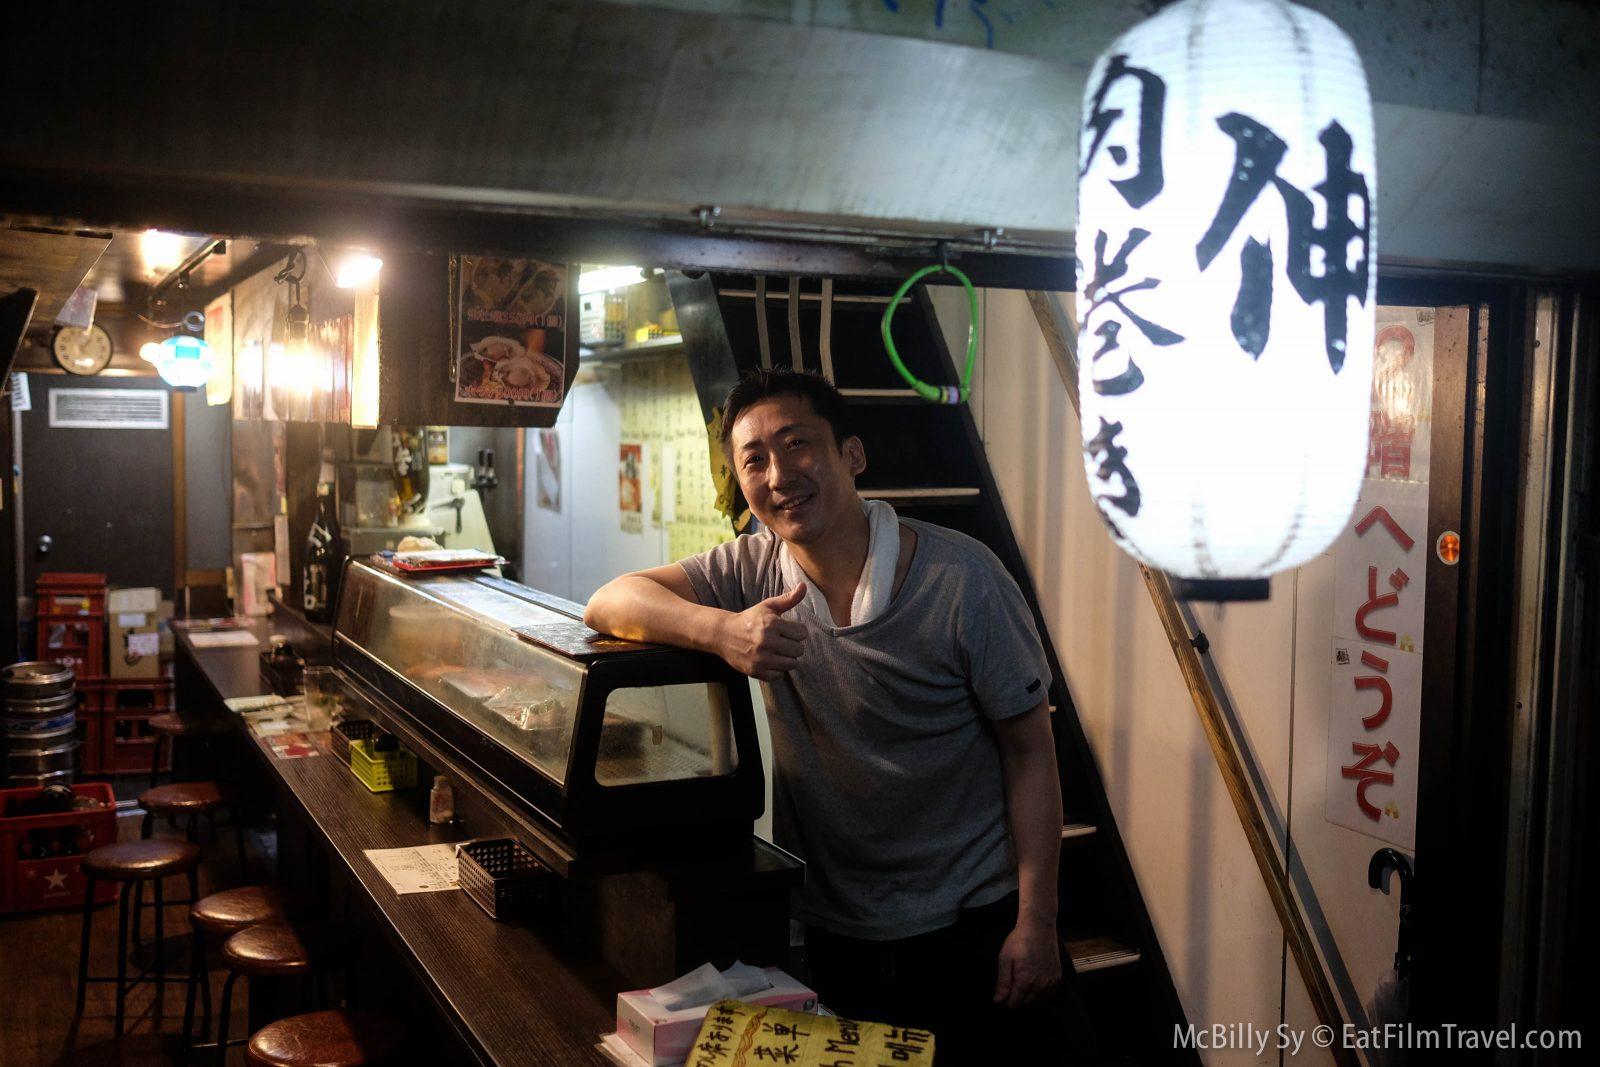 I met Nori who worked in one of the Yakitori restaurants.